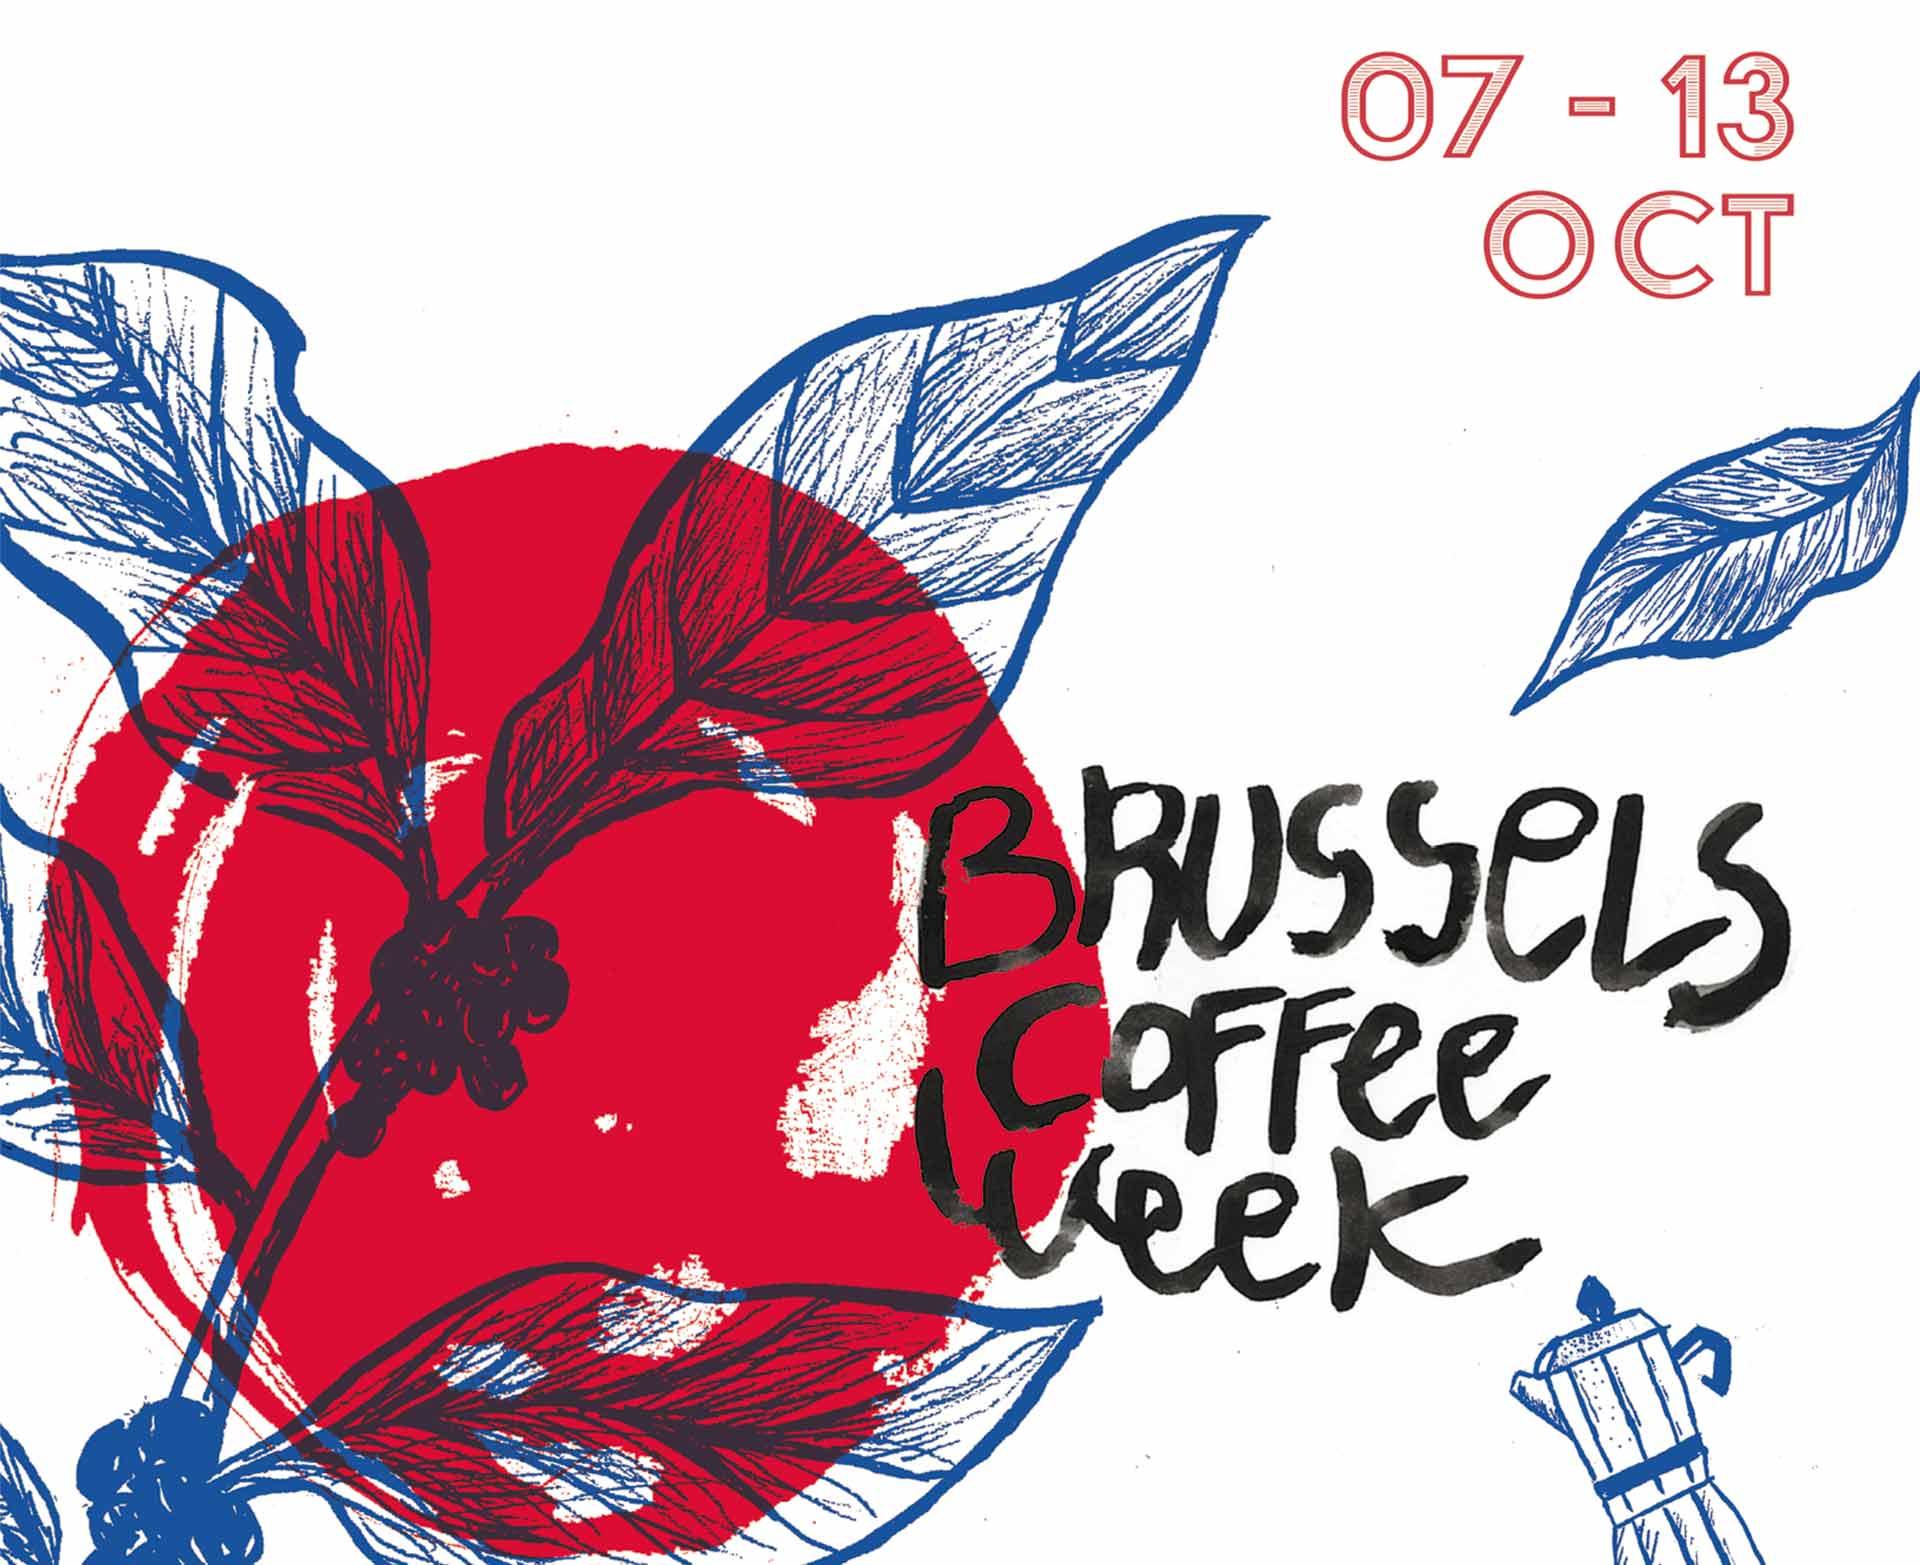 Kaffee-Events, Festival und Kalender: Brussels Coffee Week. CafCaf – Kaffee & Blog, Kaffeeblog